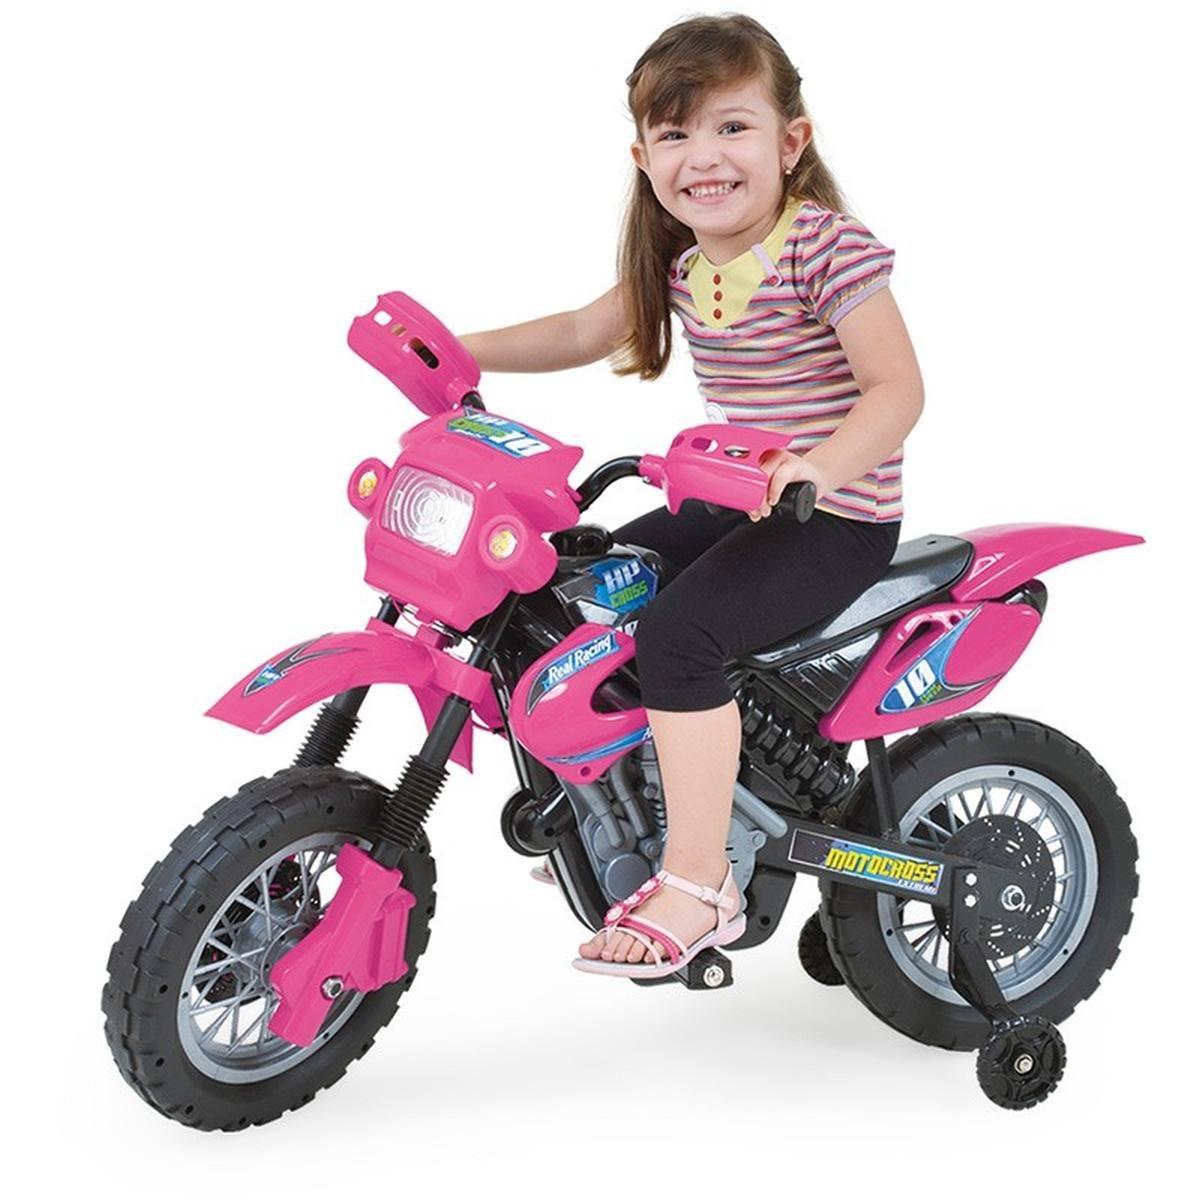 Moto el trica infantil motocross rosa homeplay r 519 for Homeplay